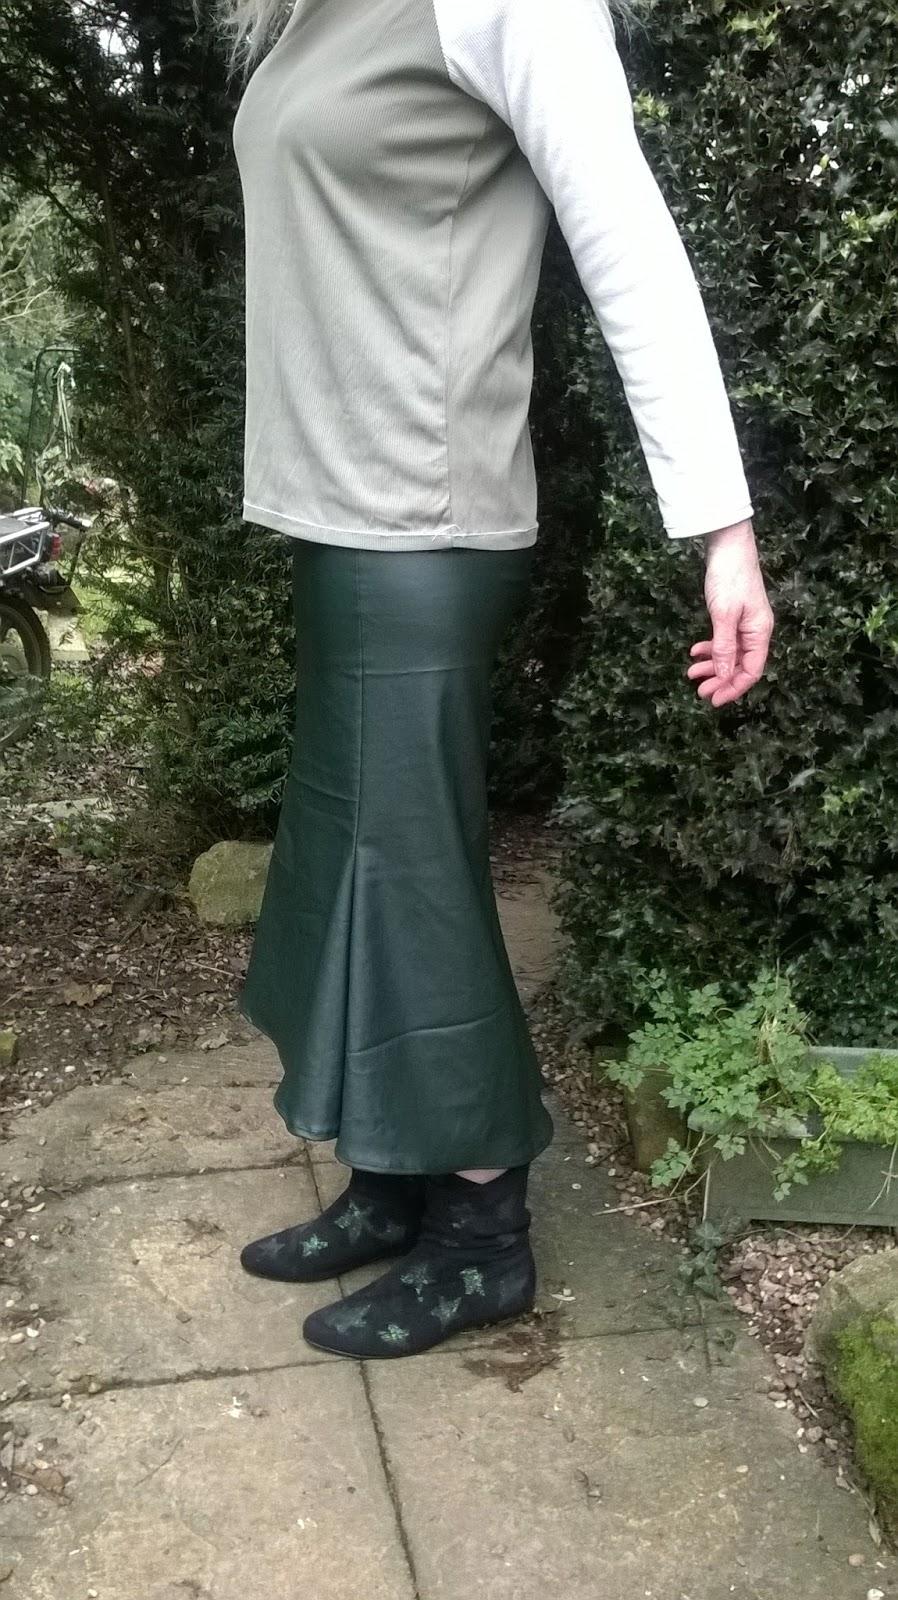 https://brackencrafts.blogspot.com/2018/01/first-project-of-2018-drak-green-faux.html